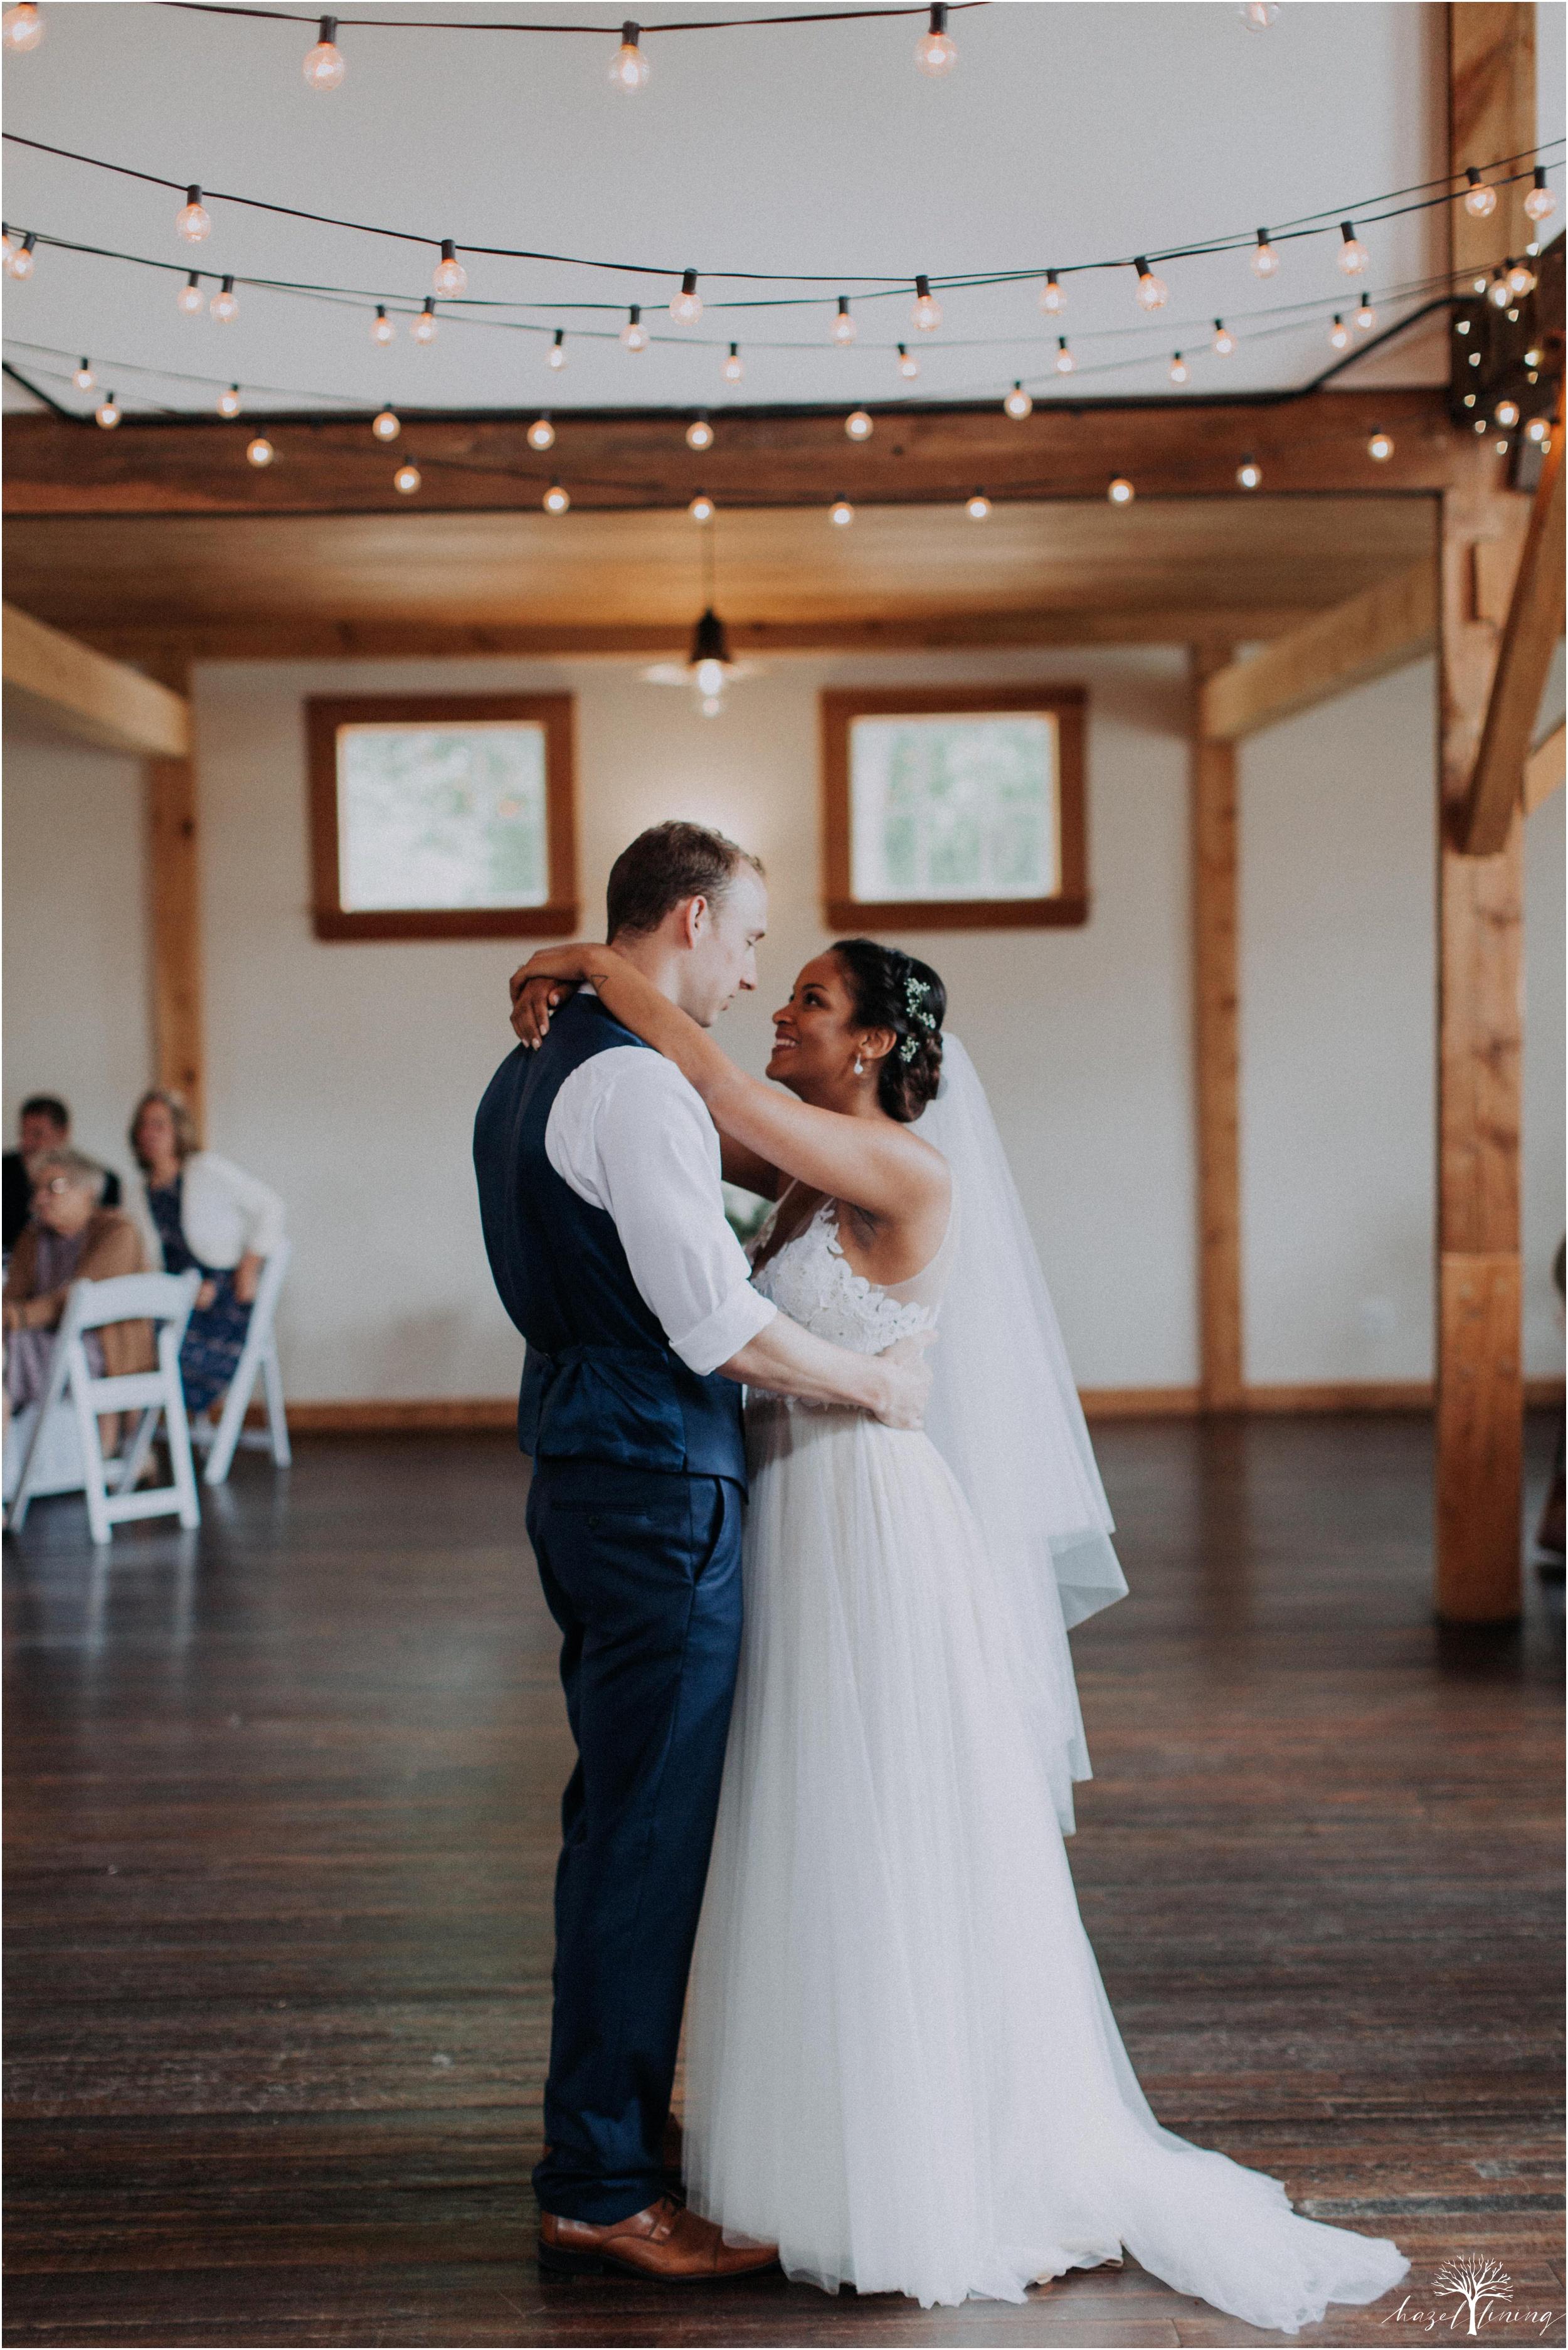 mariah-kreyling-samuel-sherratt-sherrattwiththeworld-peirce-farm-at-witch-hill-boston-massachusetts-wedding-photography-hazel-lining-travel-wedding-elopement-photography_0159.jpg